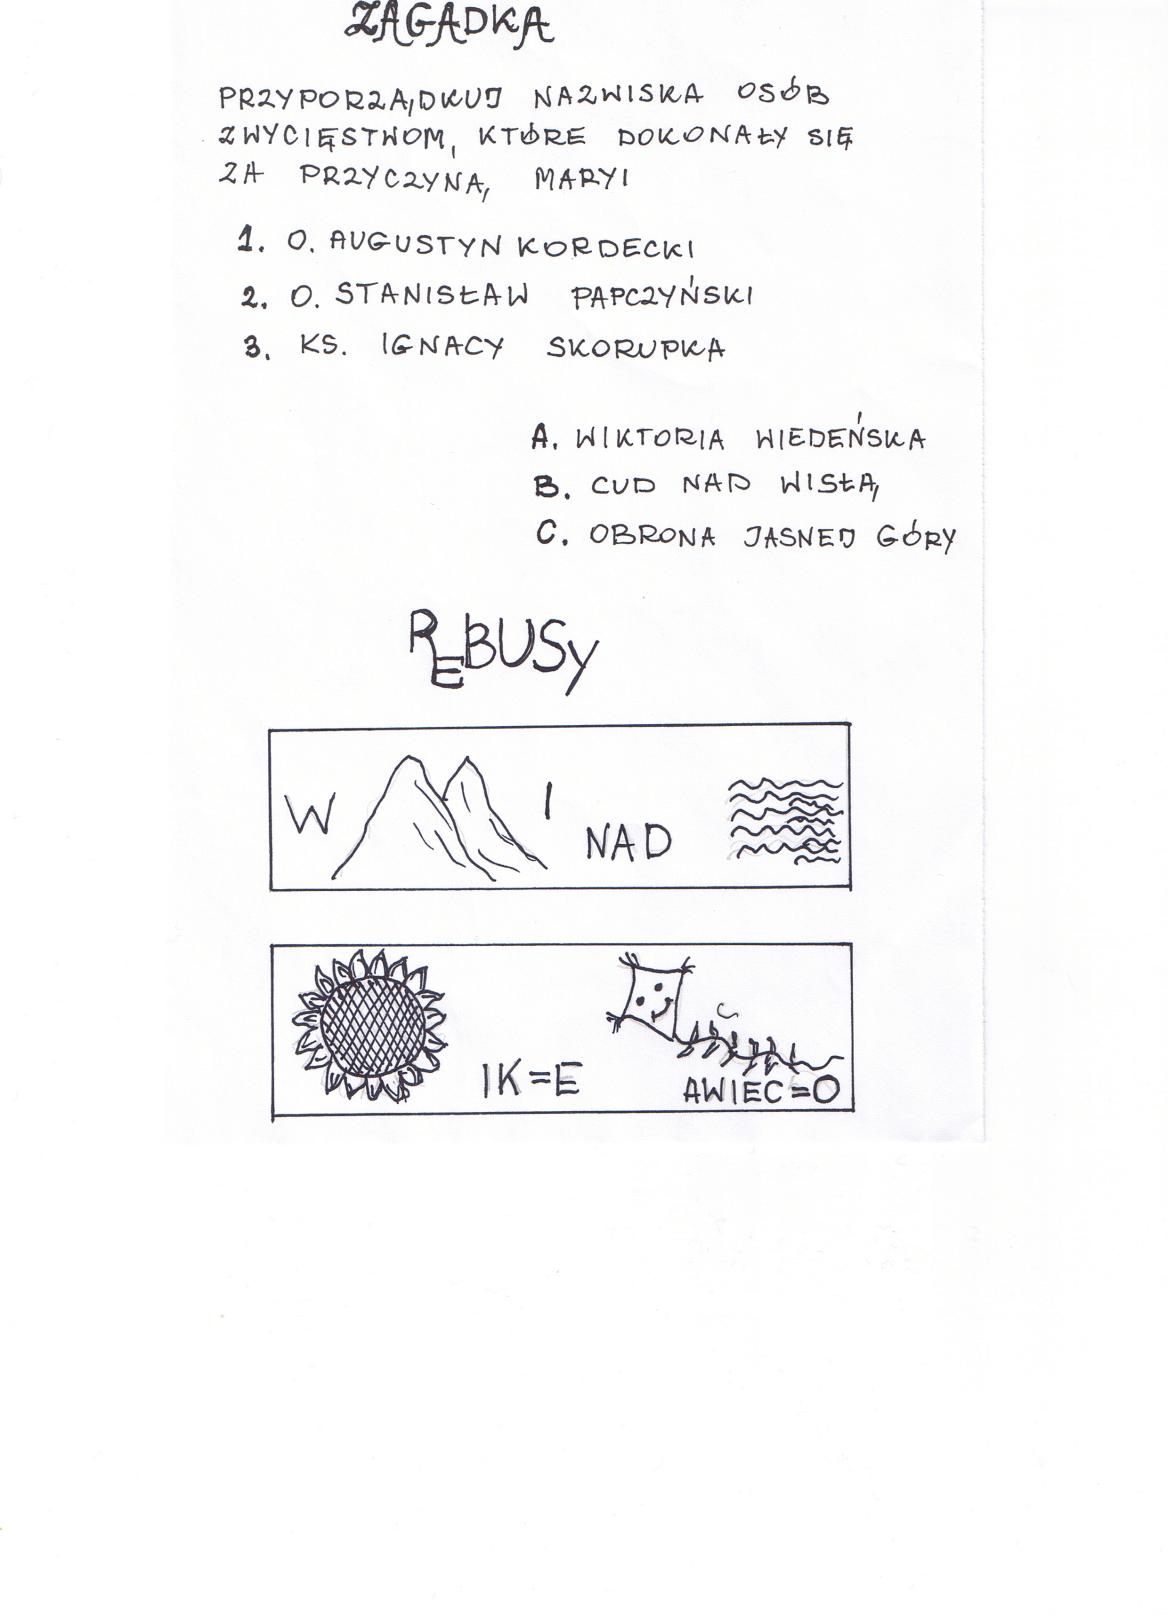 rebus199